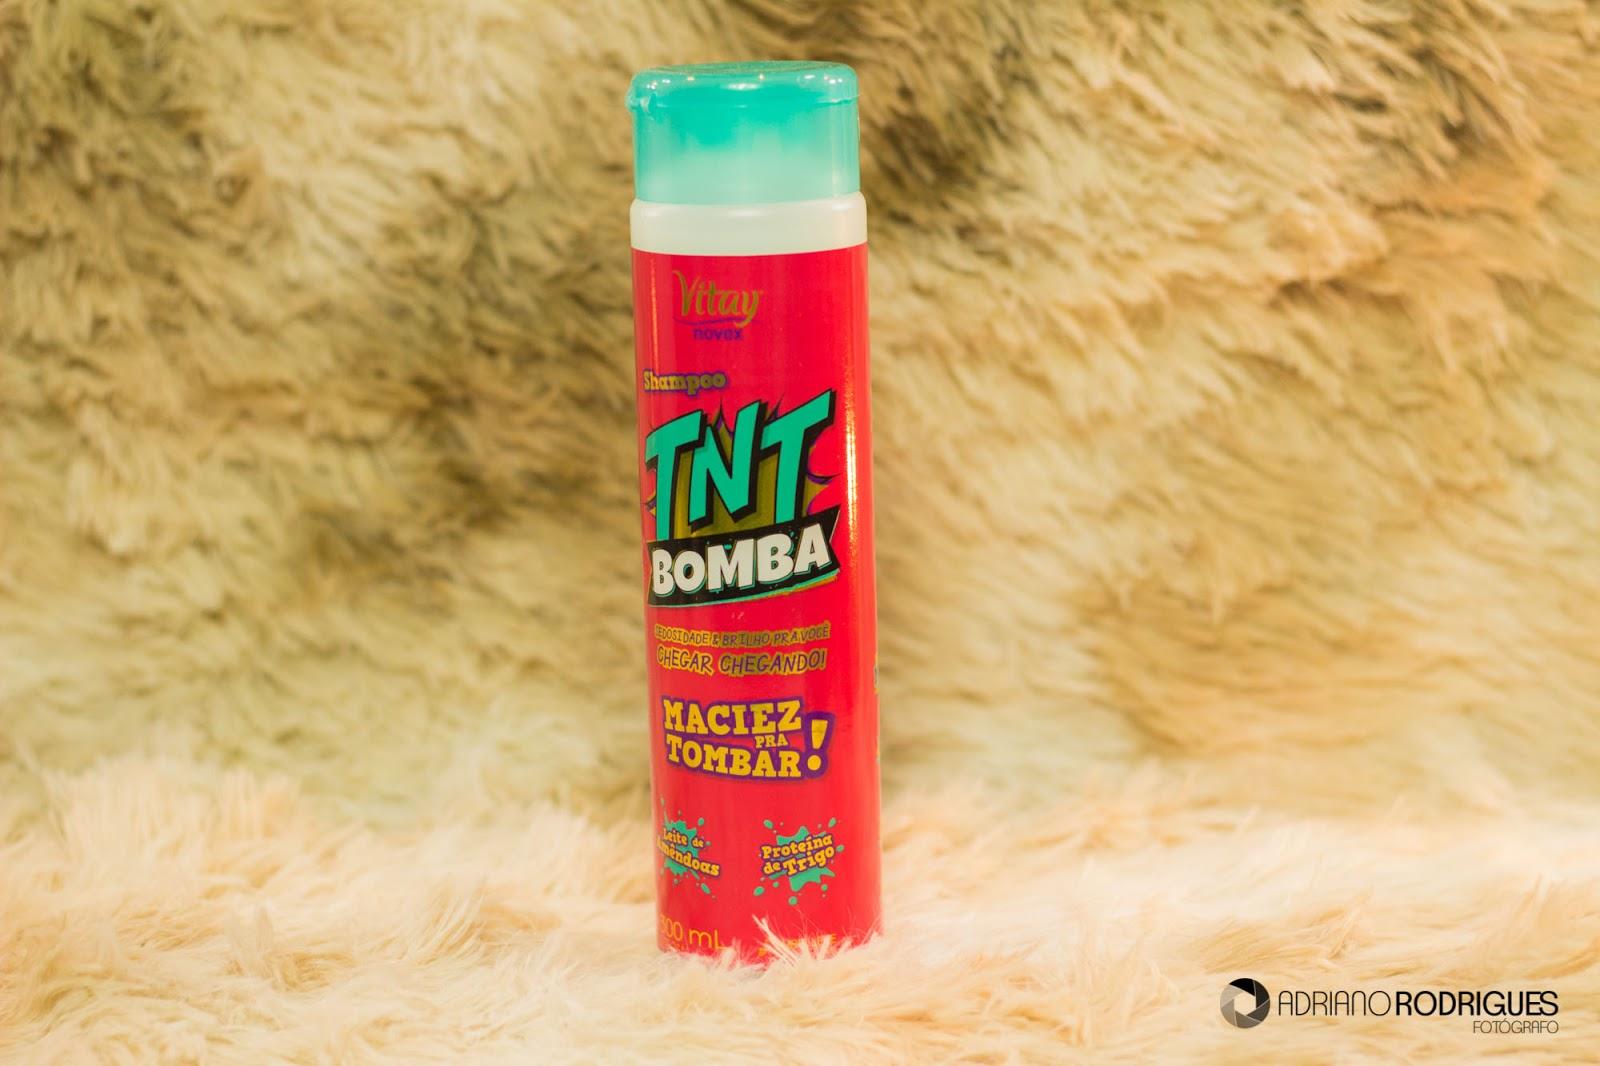 Shampoo TNT Bomba – Embelleze